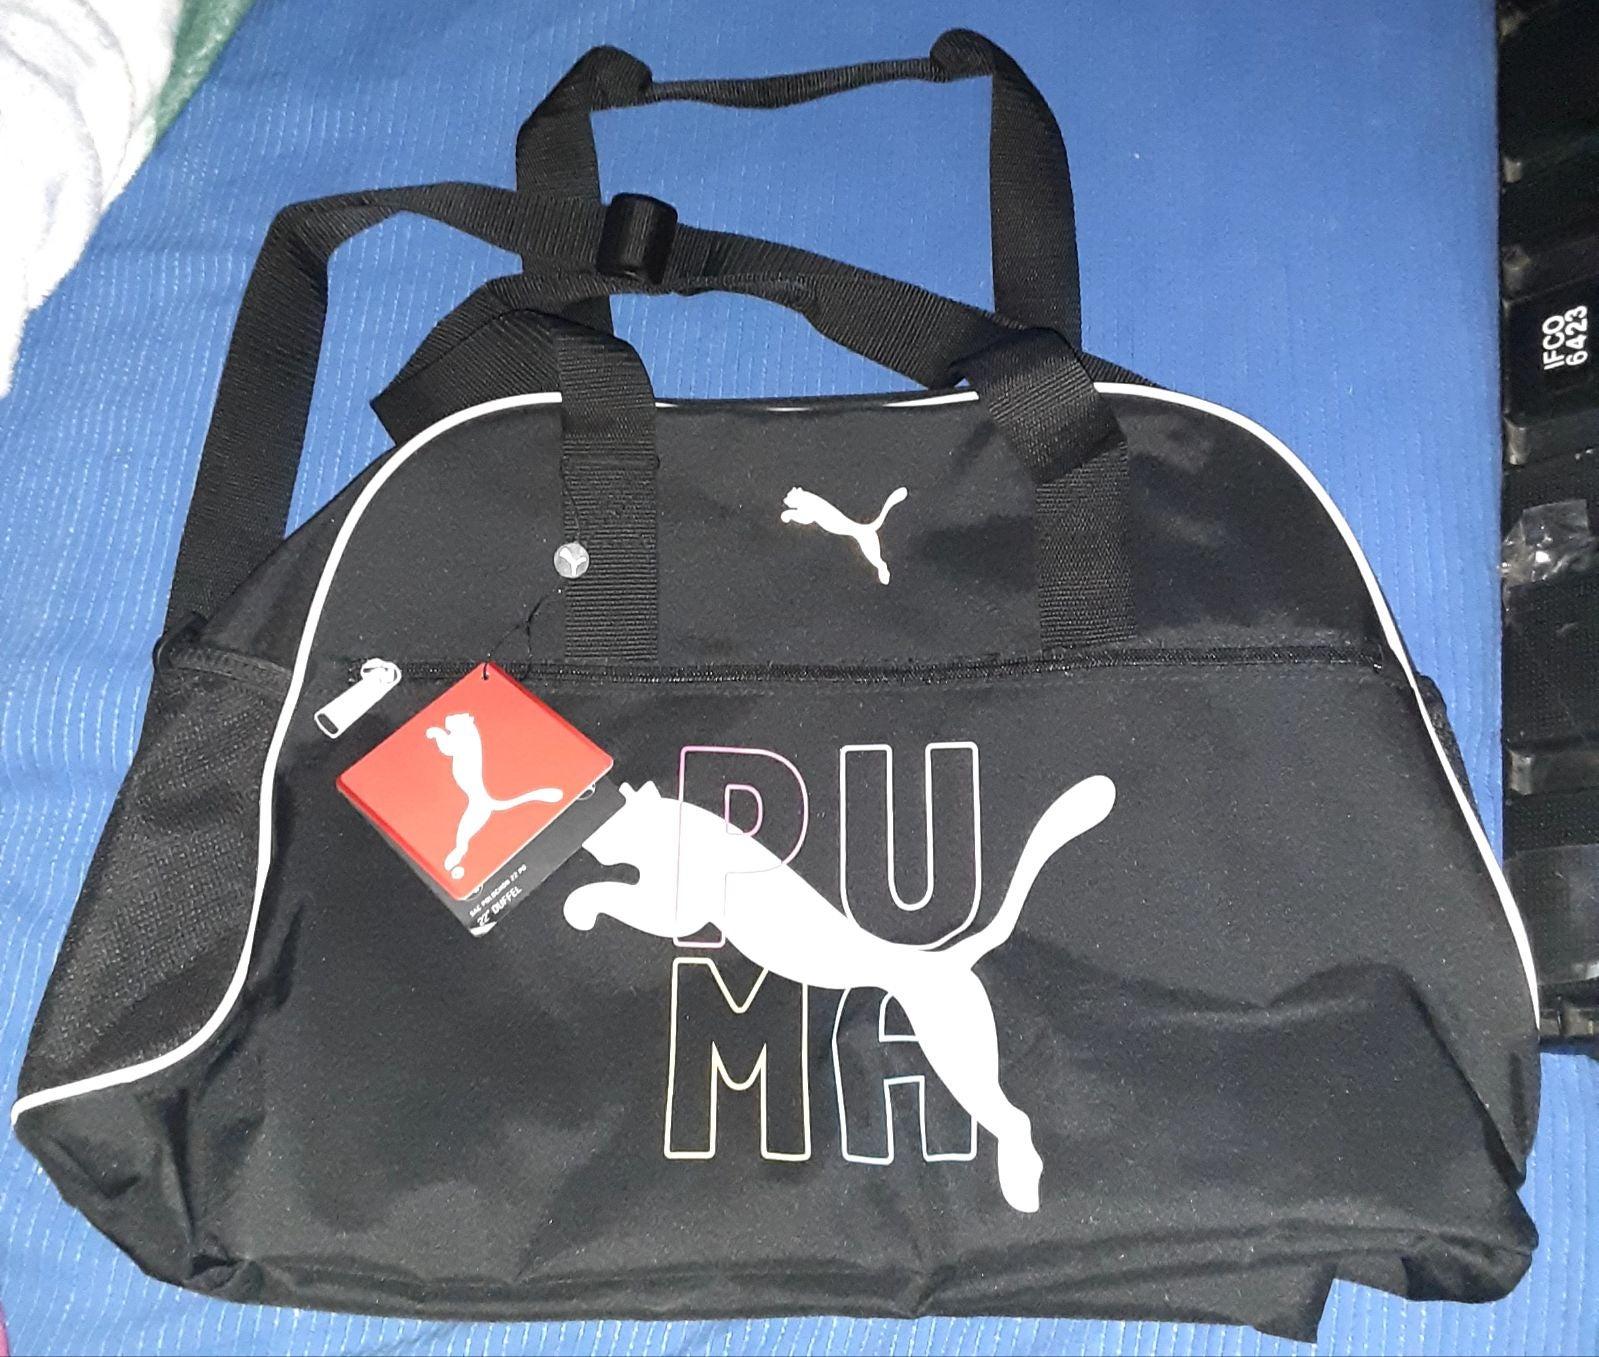 Puma Duffle Bag